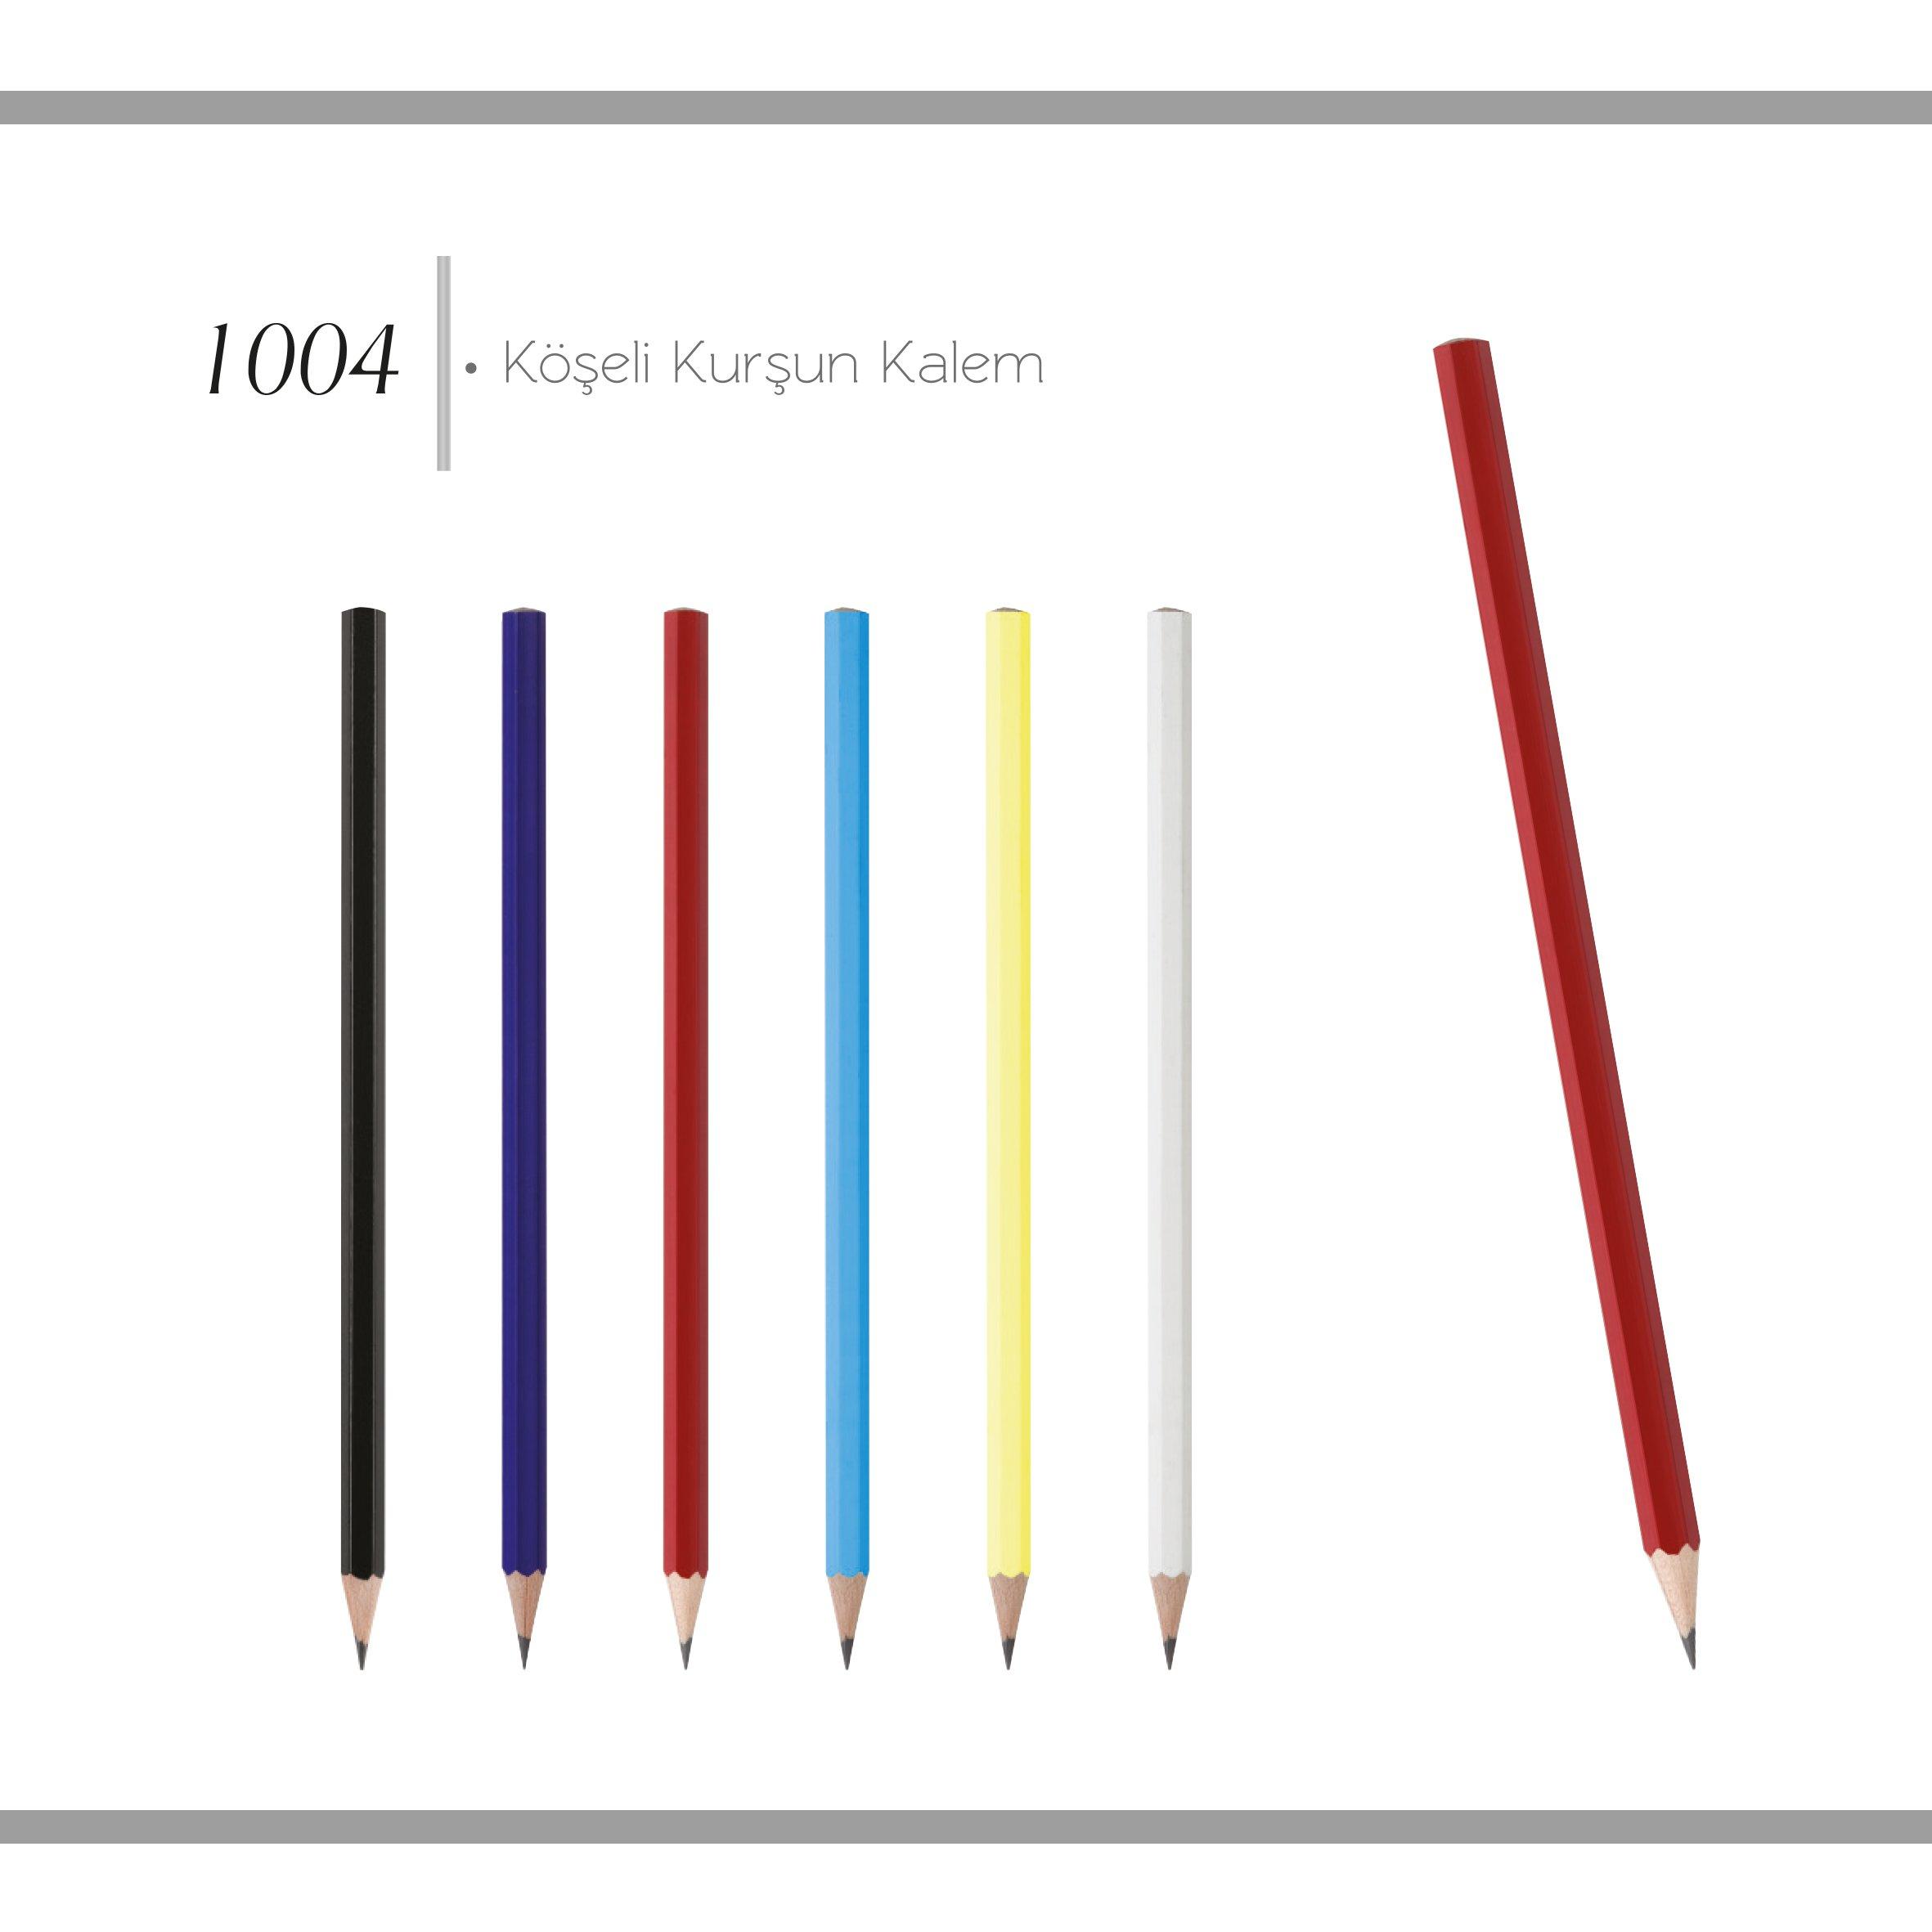 promosyon-promosyon ürünleri-promosyon kalemler-kurşun kalemler-promosyon ahşap kurşun kalem 1004